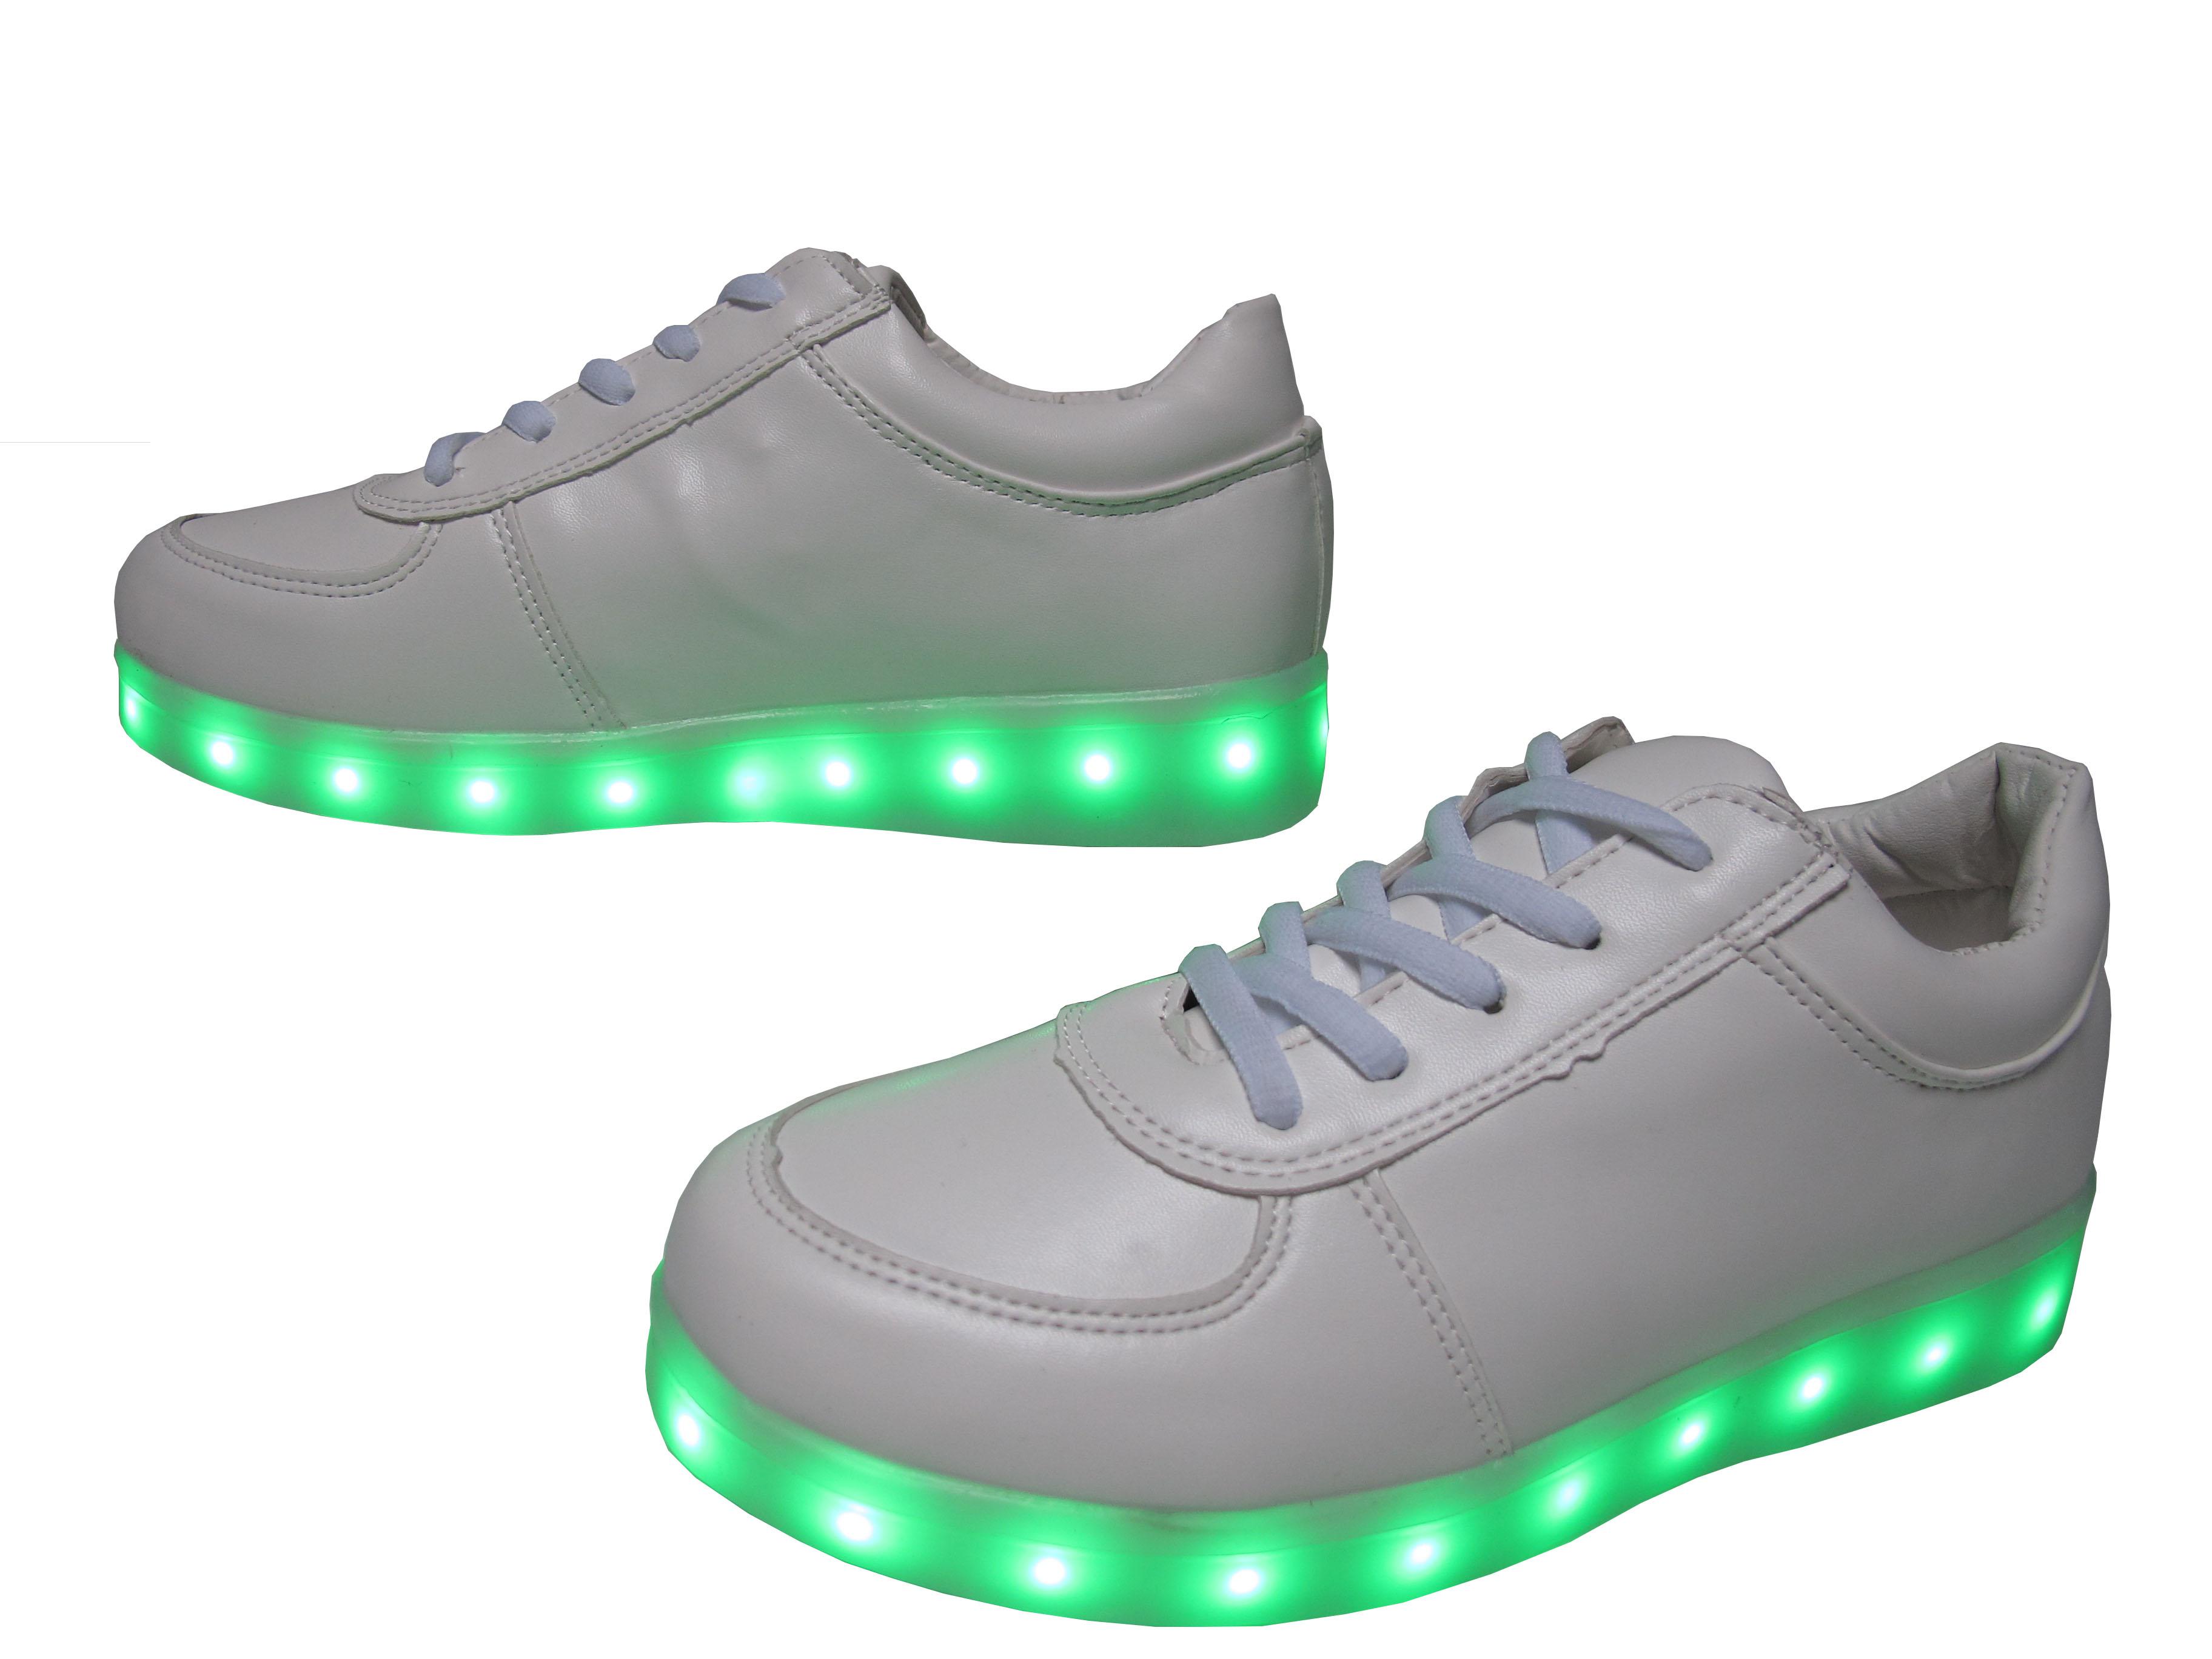 ff59ecd567e Дамски спортни обувки/светещи/еко кожа бели 6002-2 | Юношески обувки ...